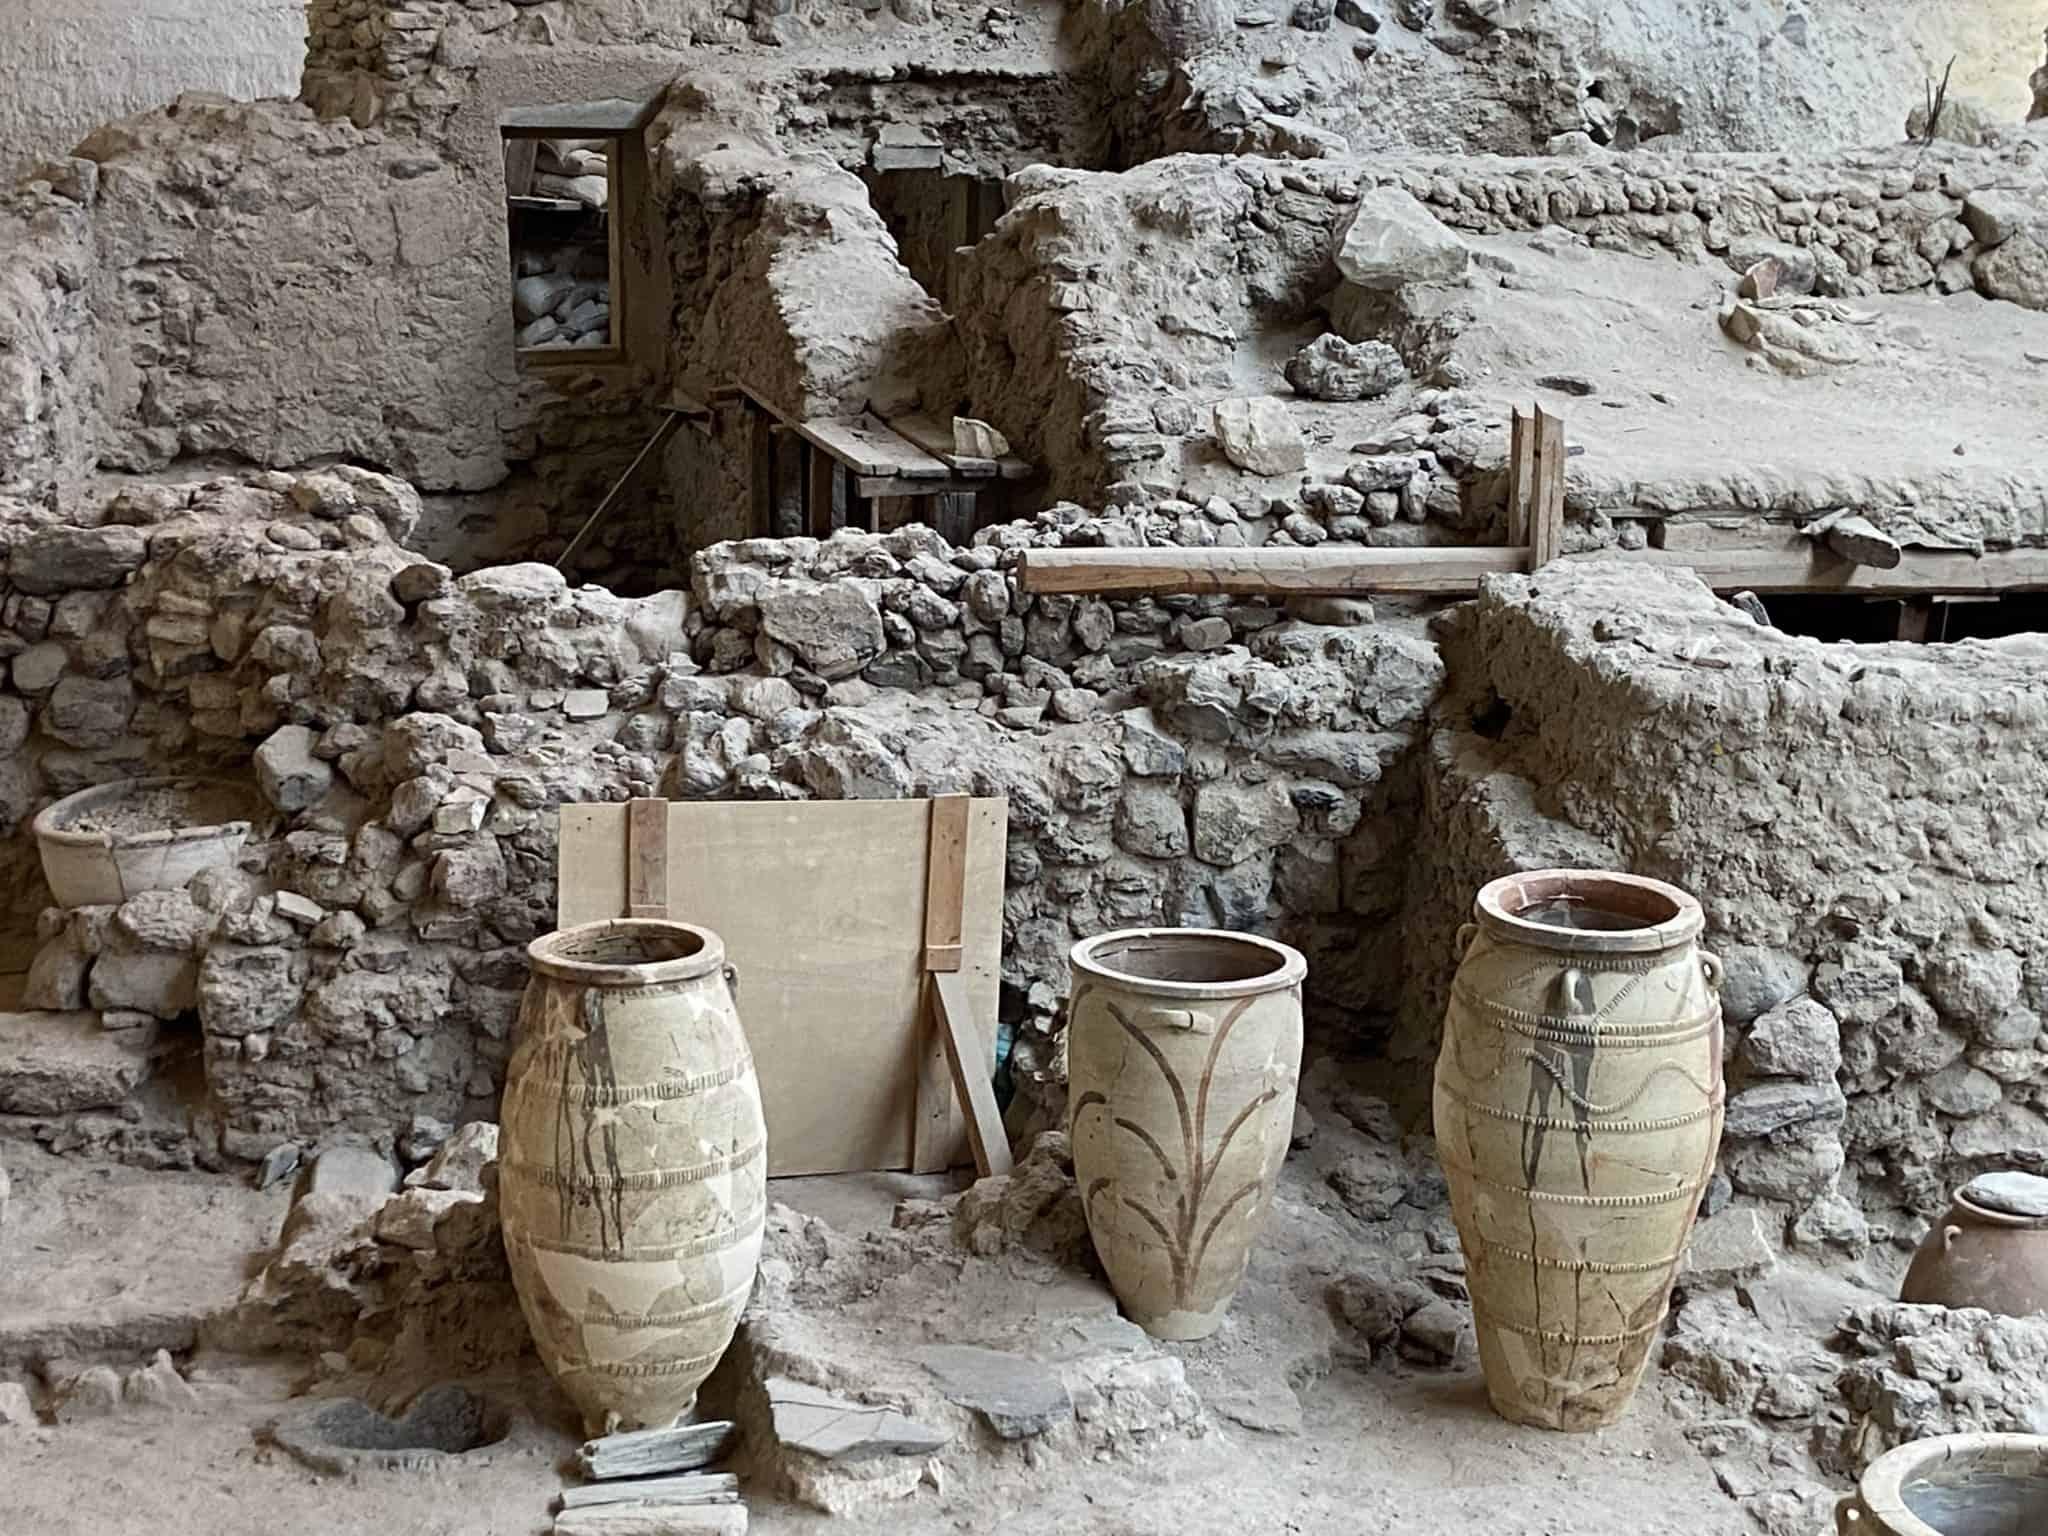 santorini greece artifacts